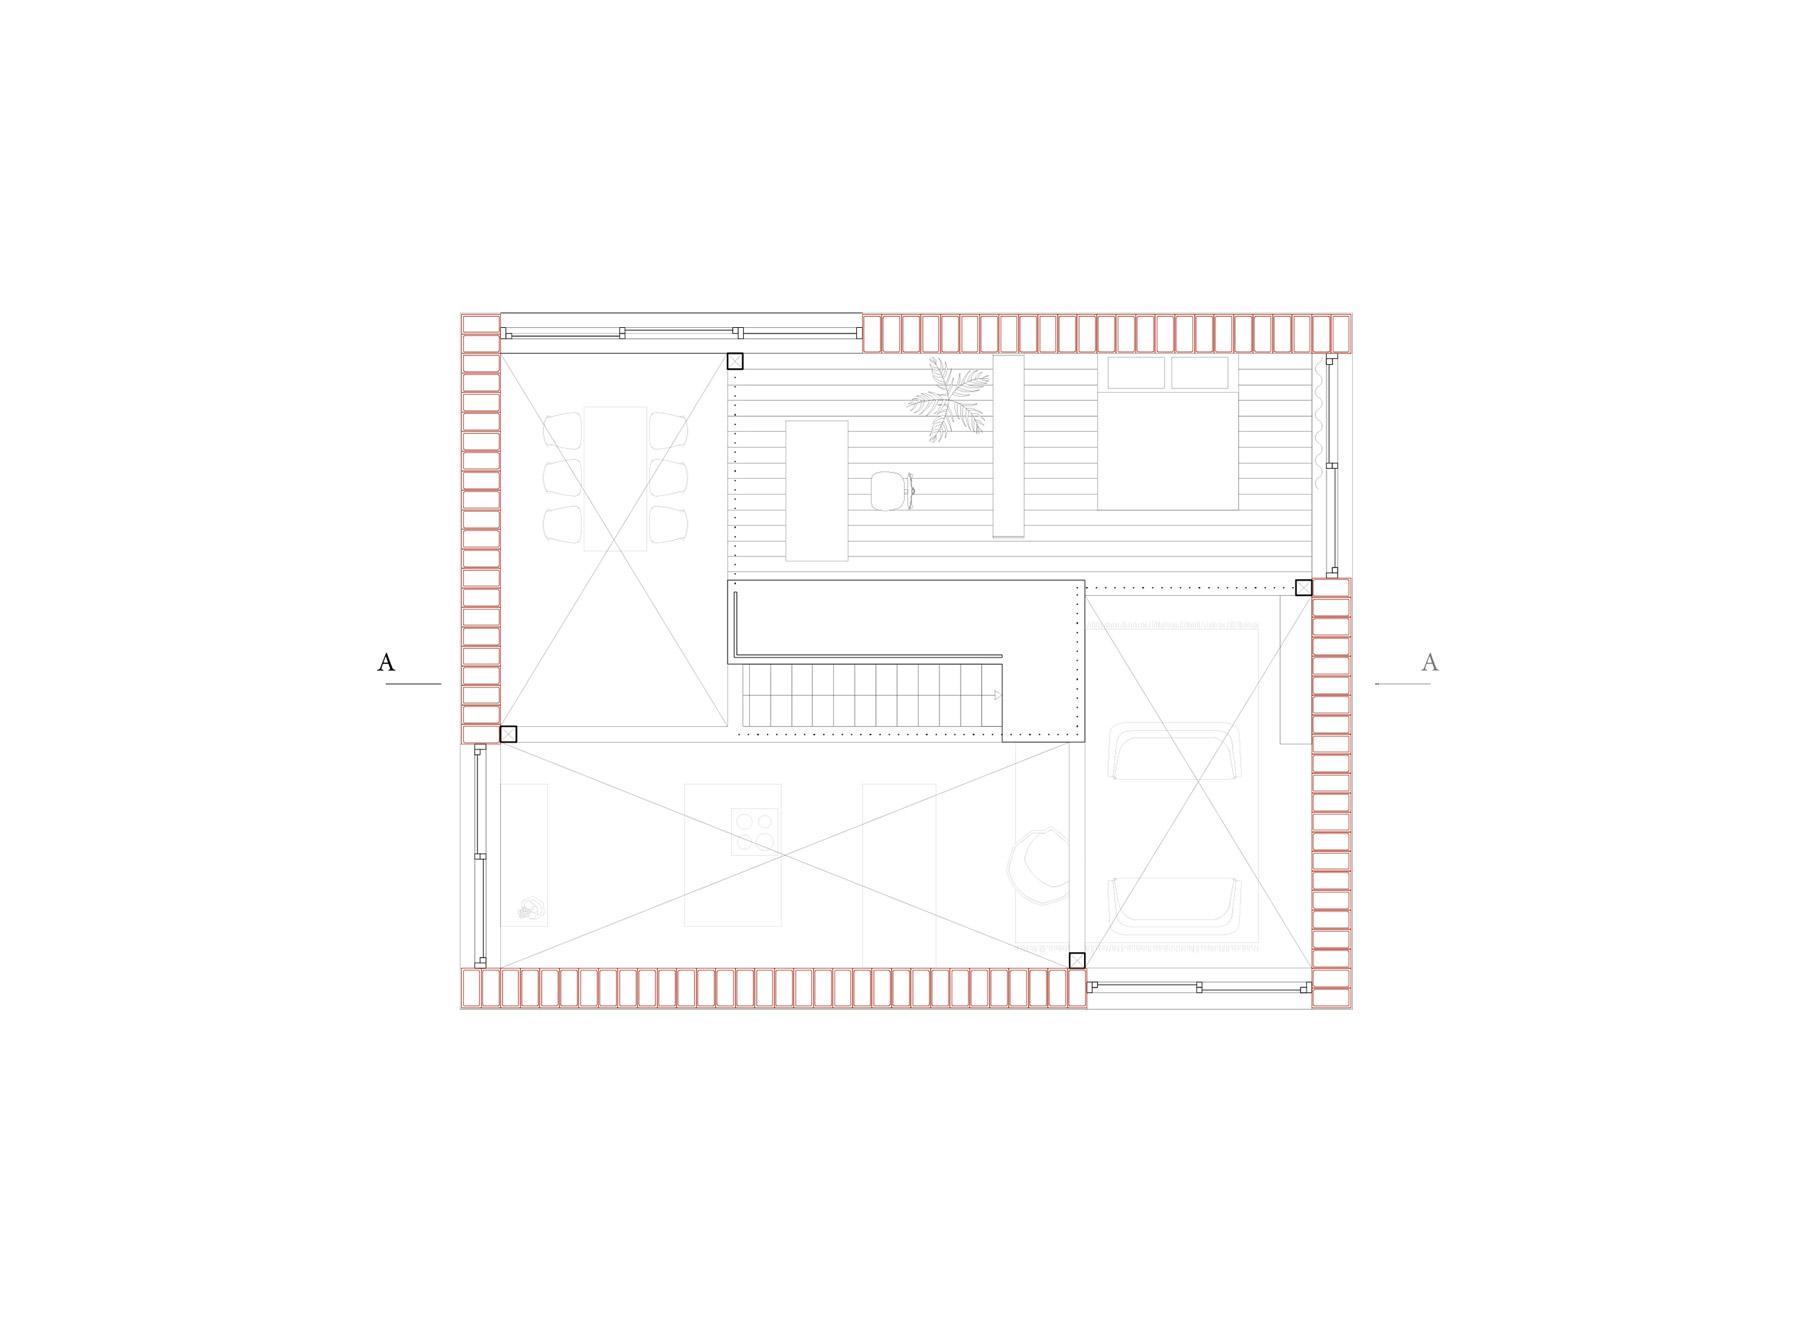 4/8 house, upper floor